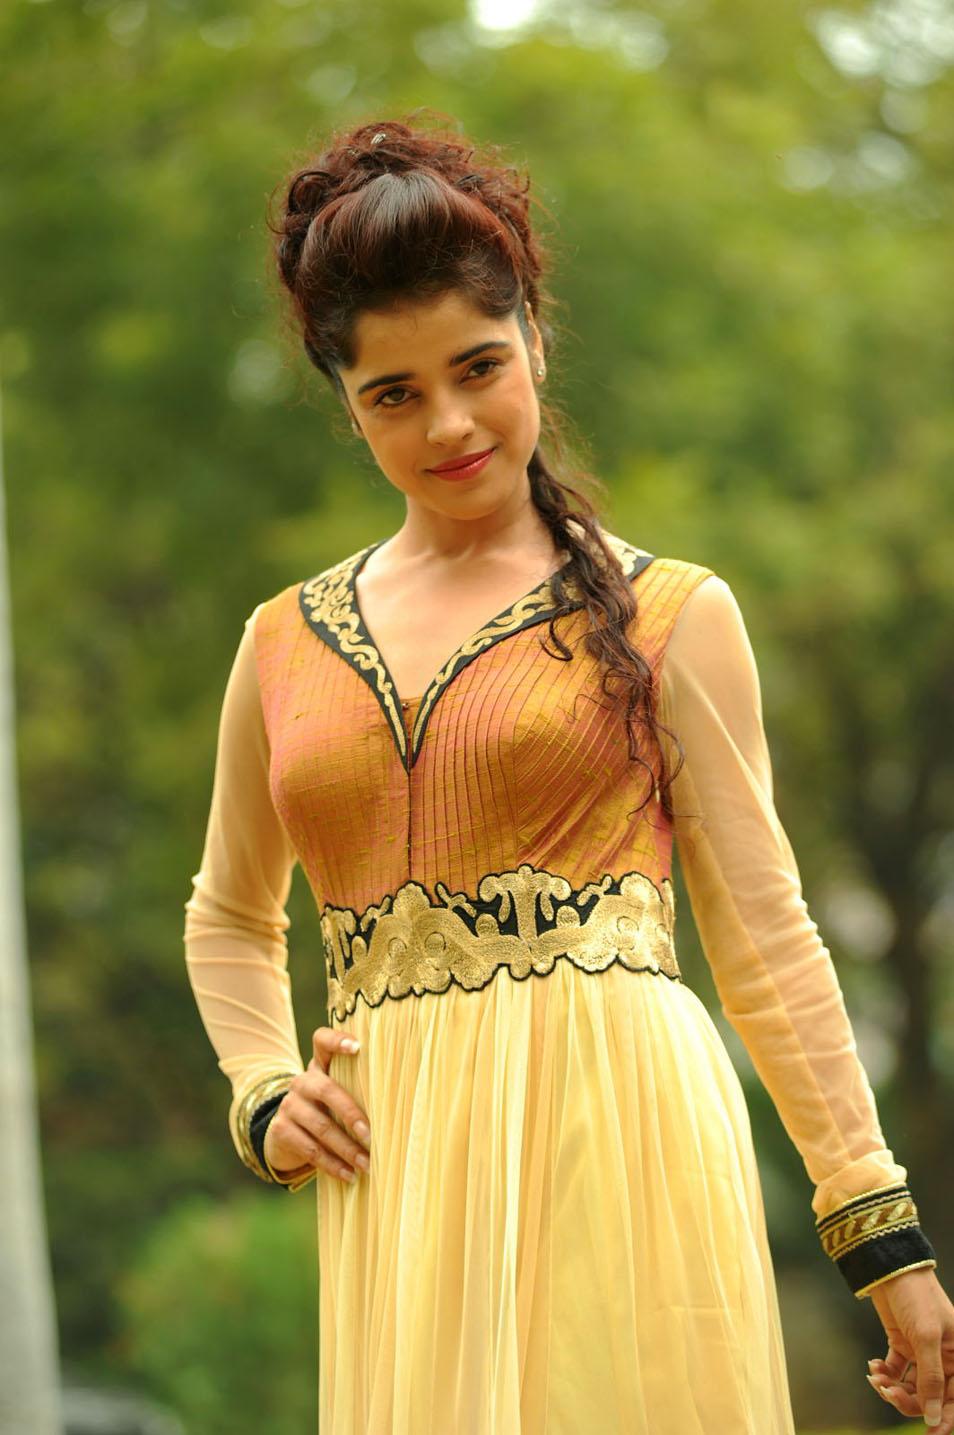 hot charming sexy Piaa bajpai photo stills